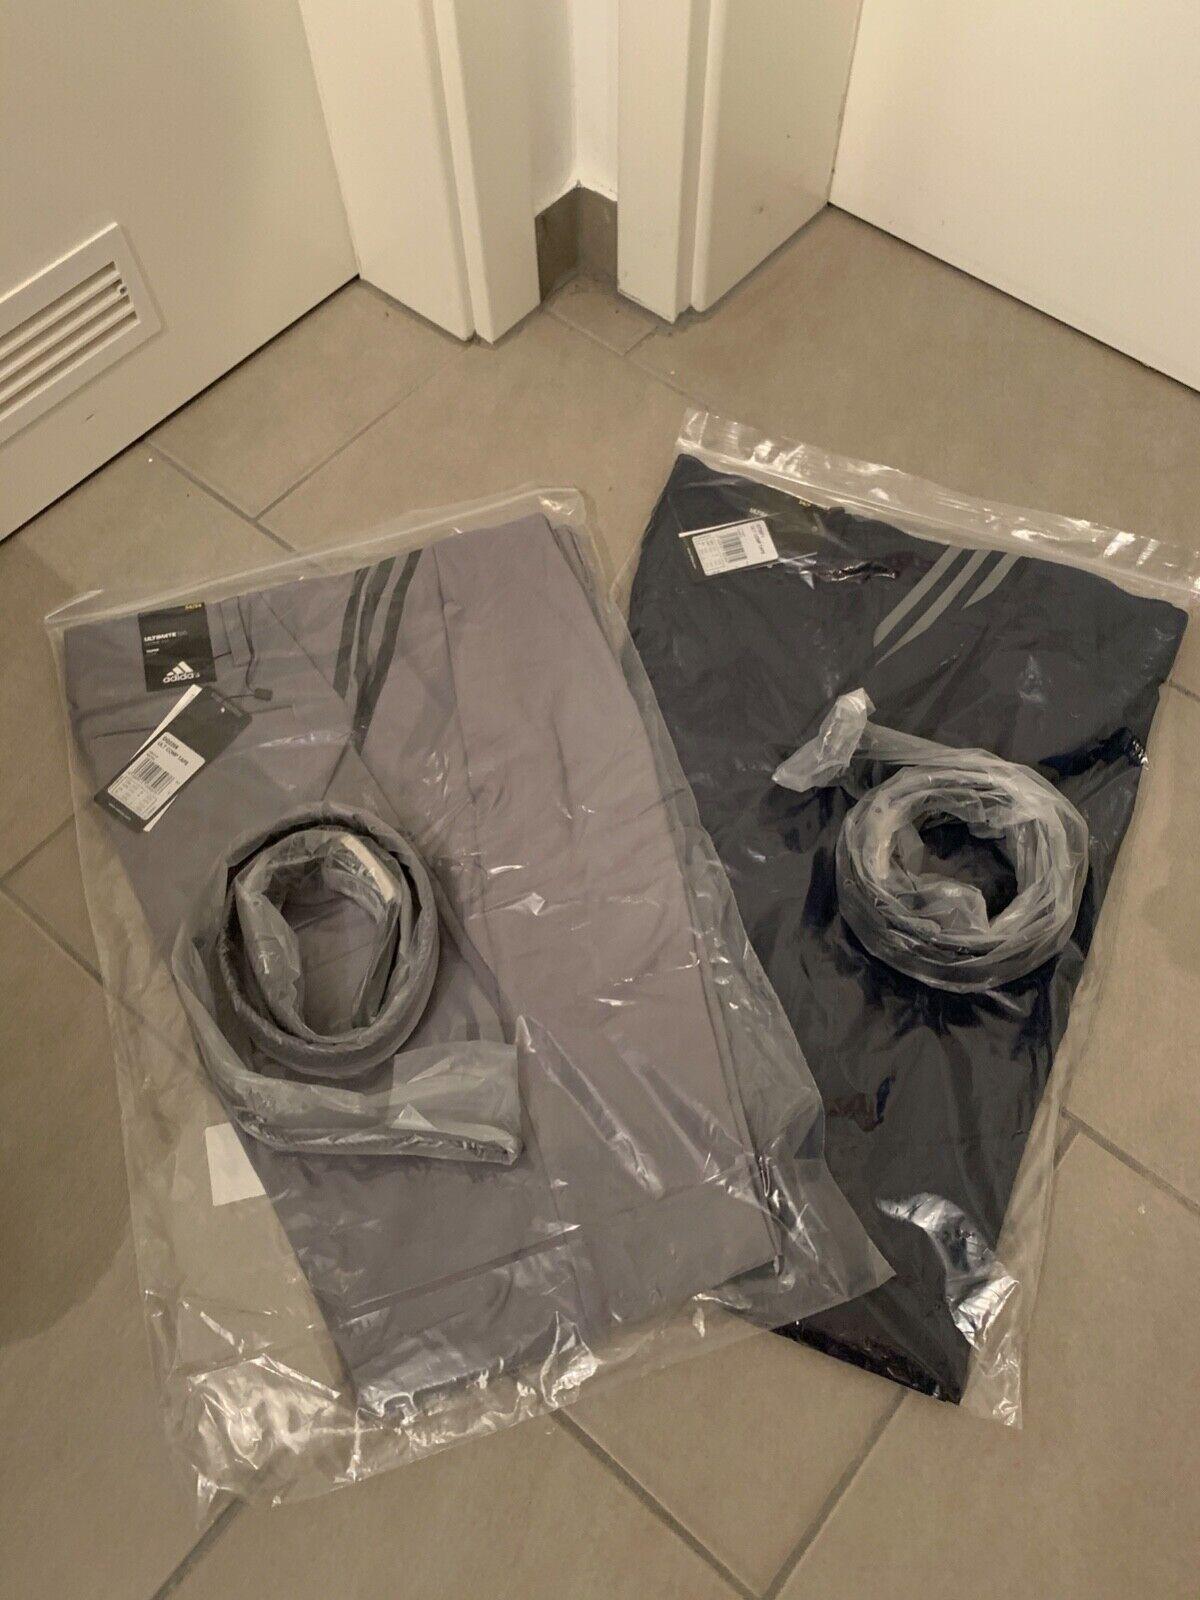 2x Adidas Ultimate 365 Herren Golfhosen 34/34 + Gürtel!! Blau und Grau-NAGELNEU